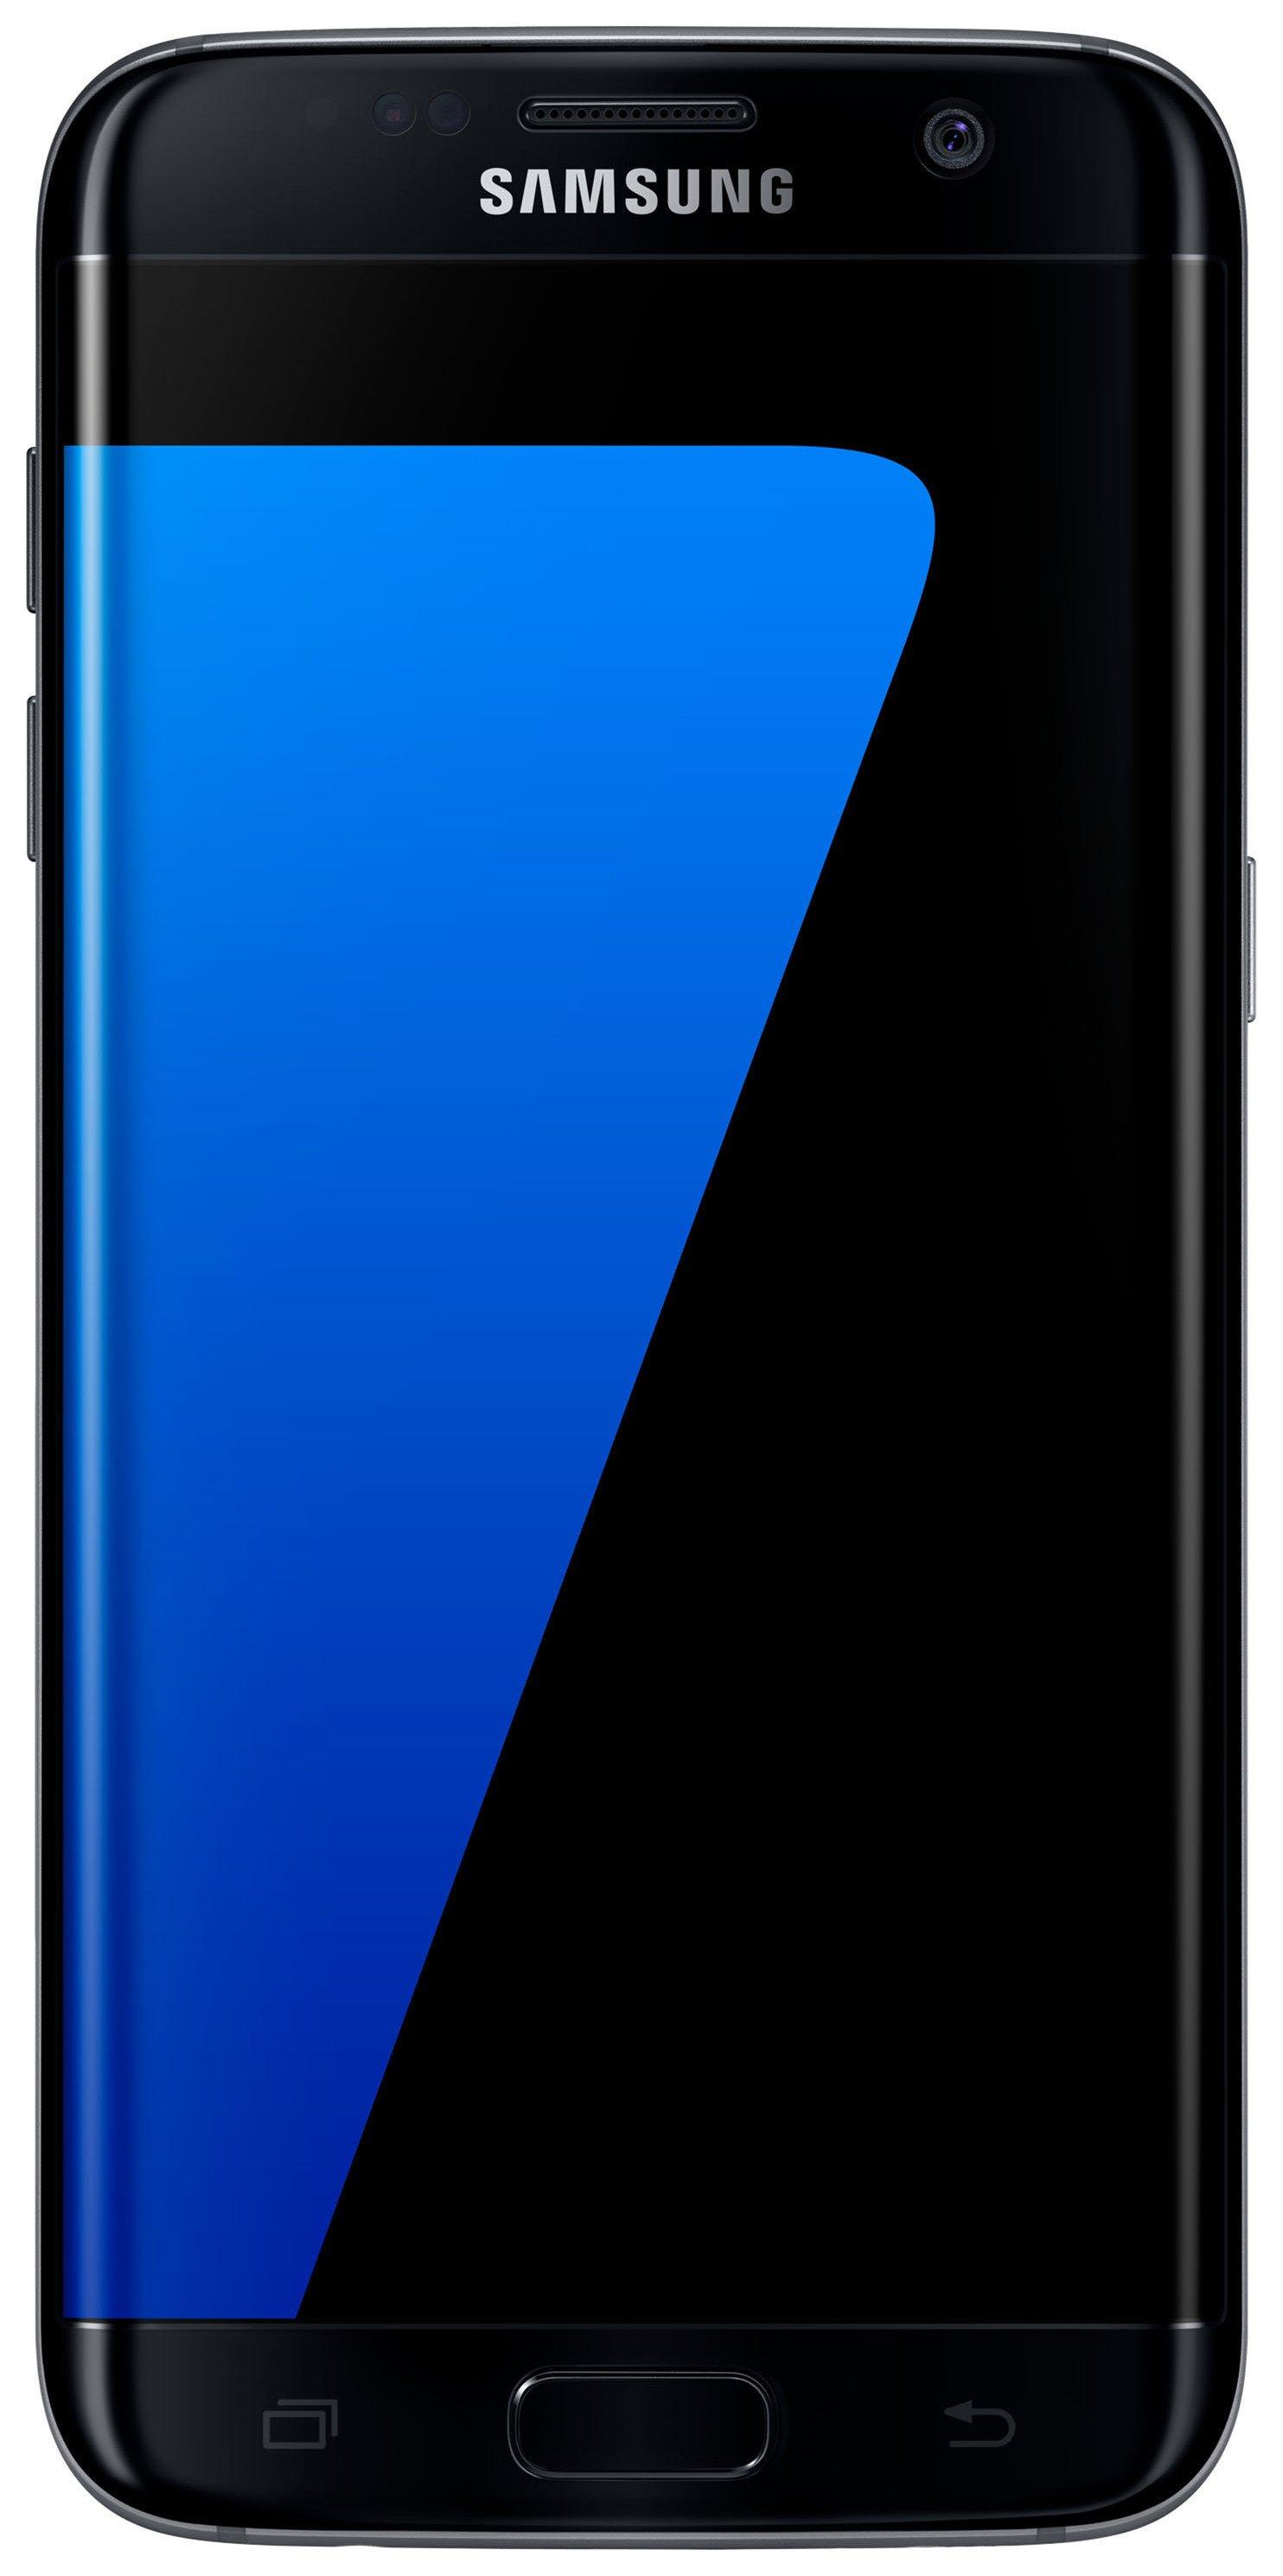 samsung edge. Sim Free Samsung Galaxy S7 Edge Mobile Phone - Black G